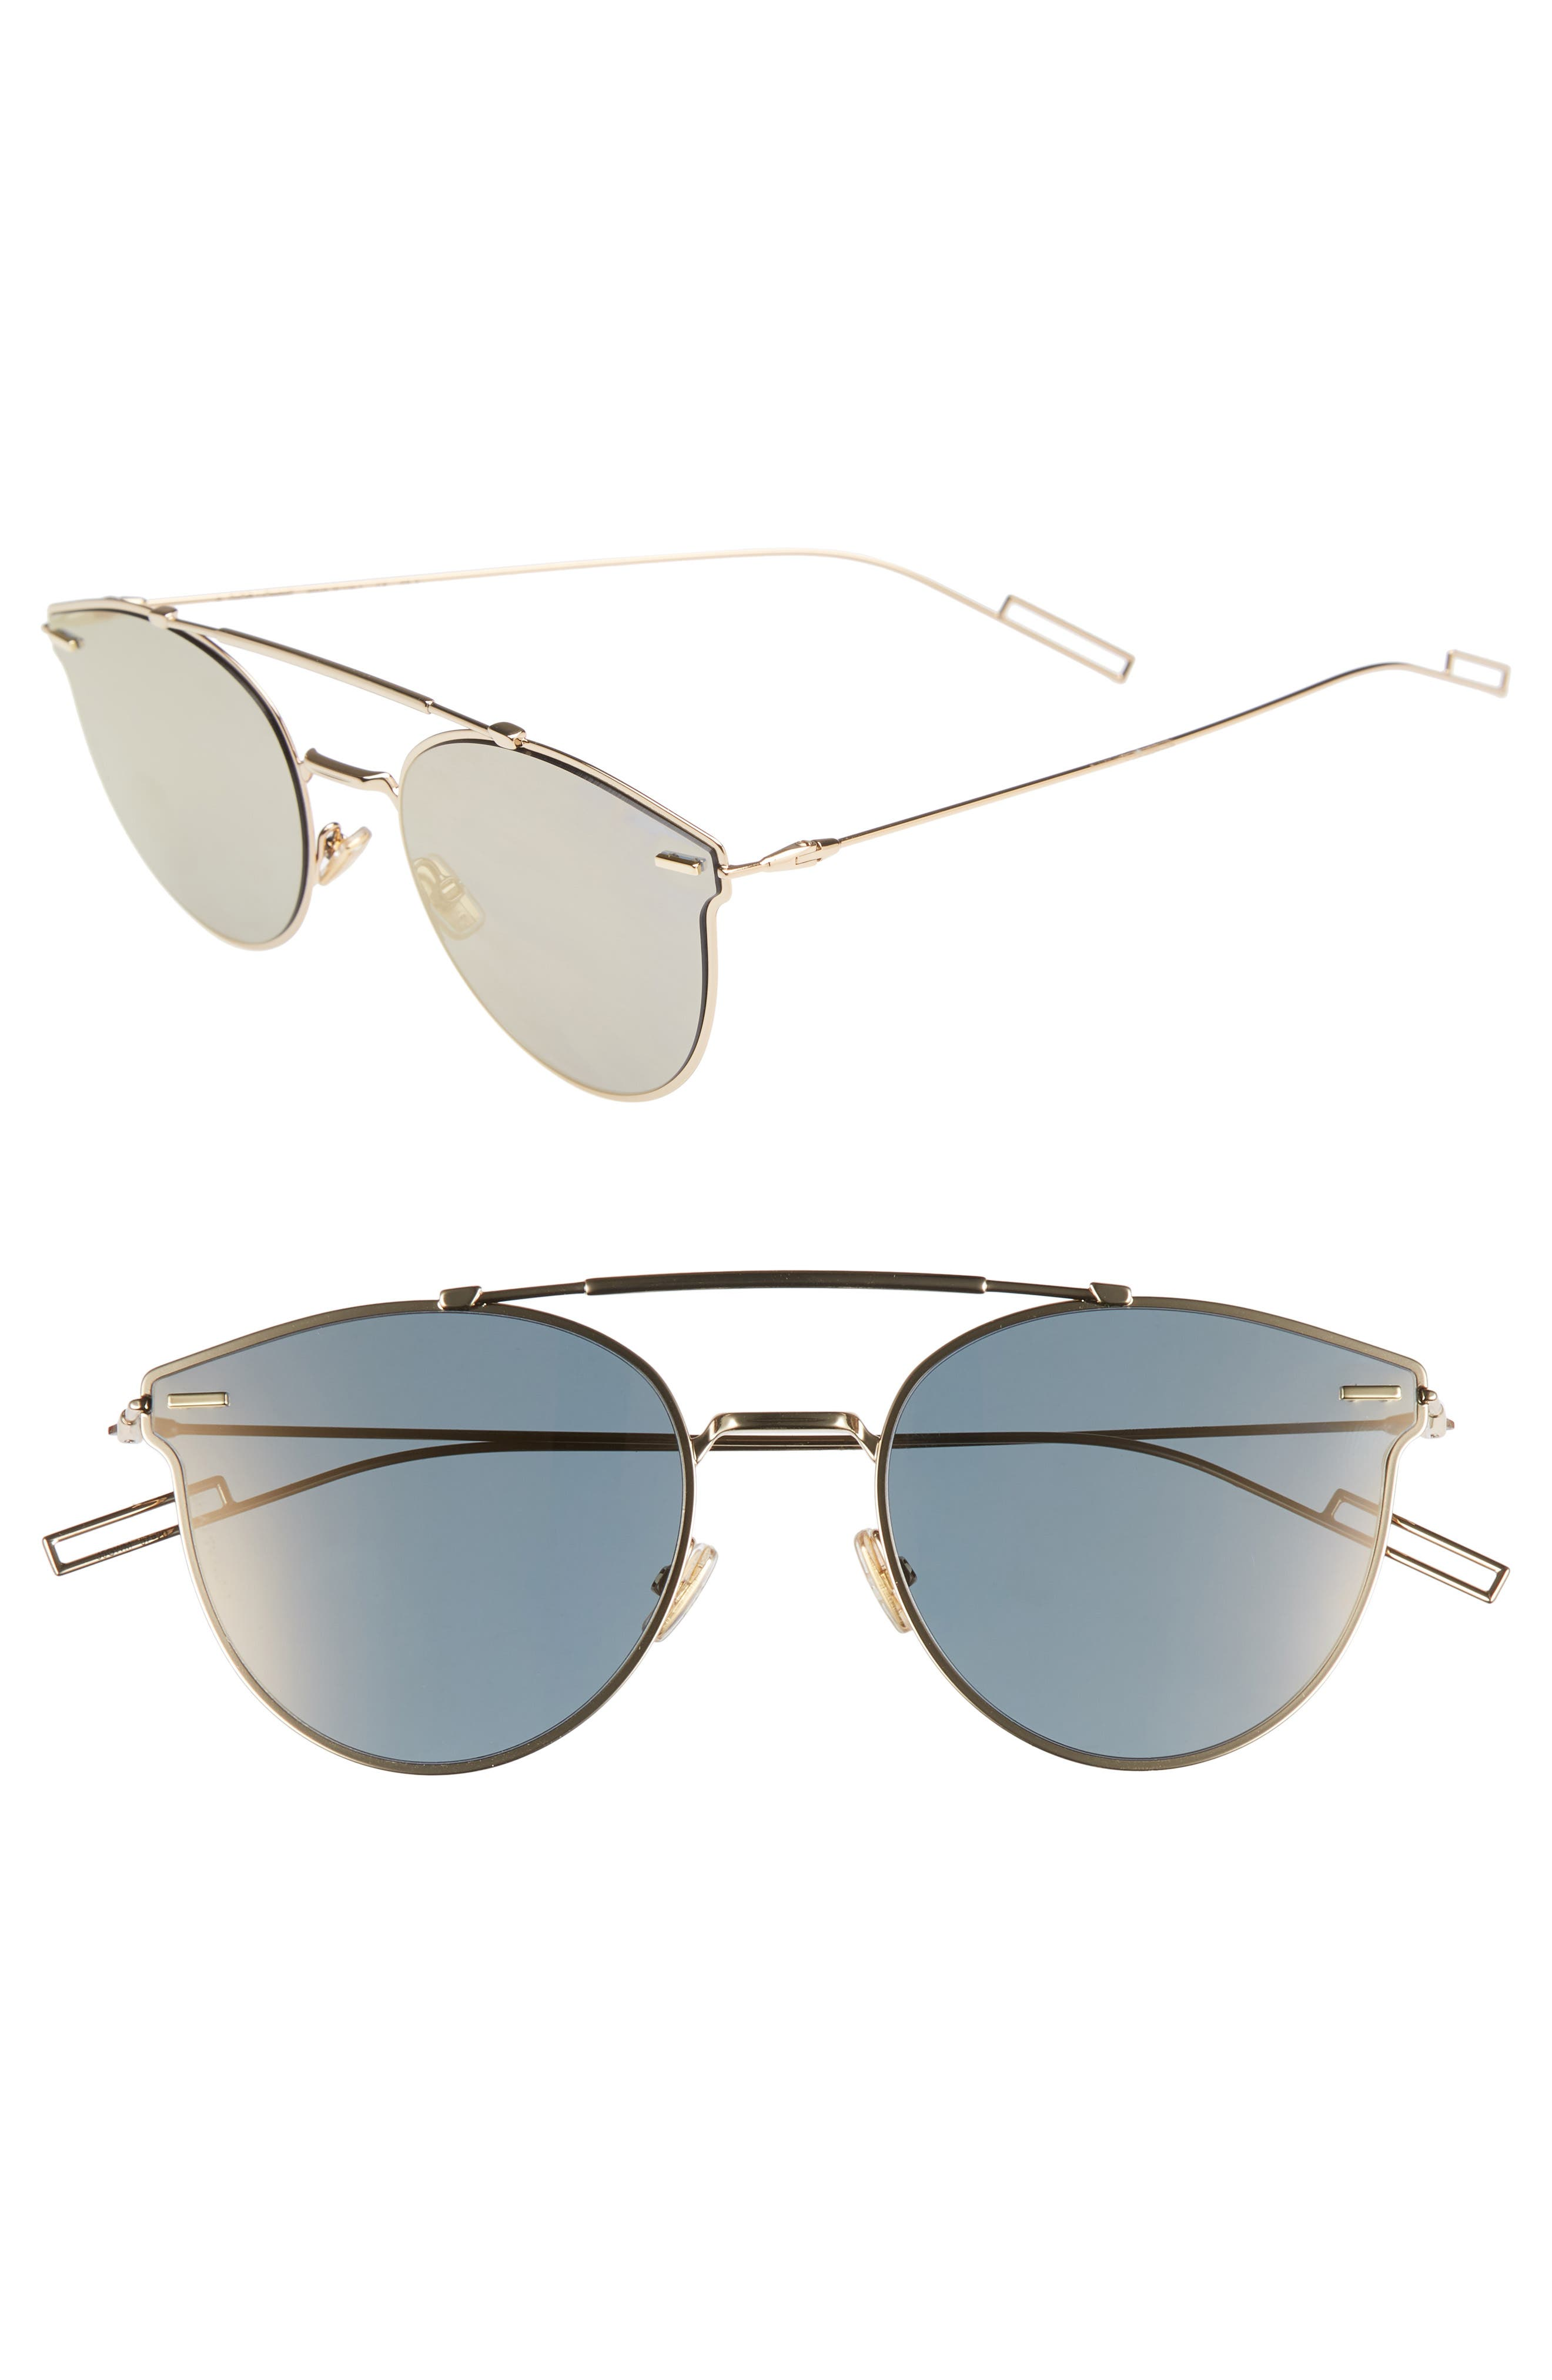 Pressure 57mm Sunglasses,                             Main thumbnail 1, color,                             GOLD